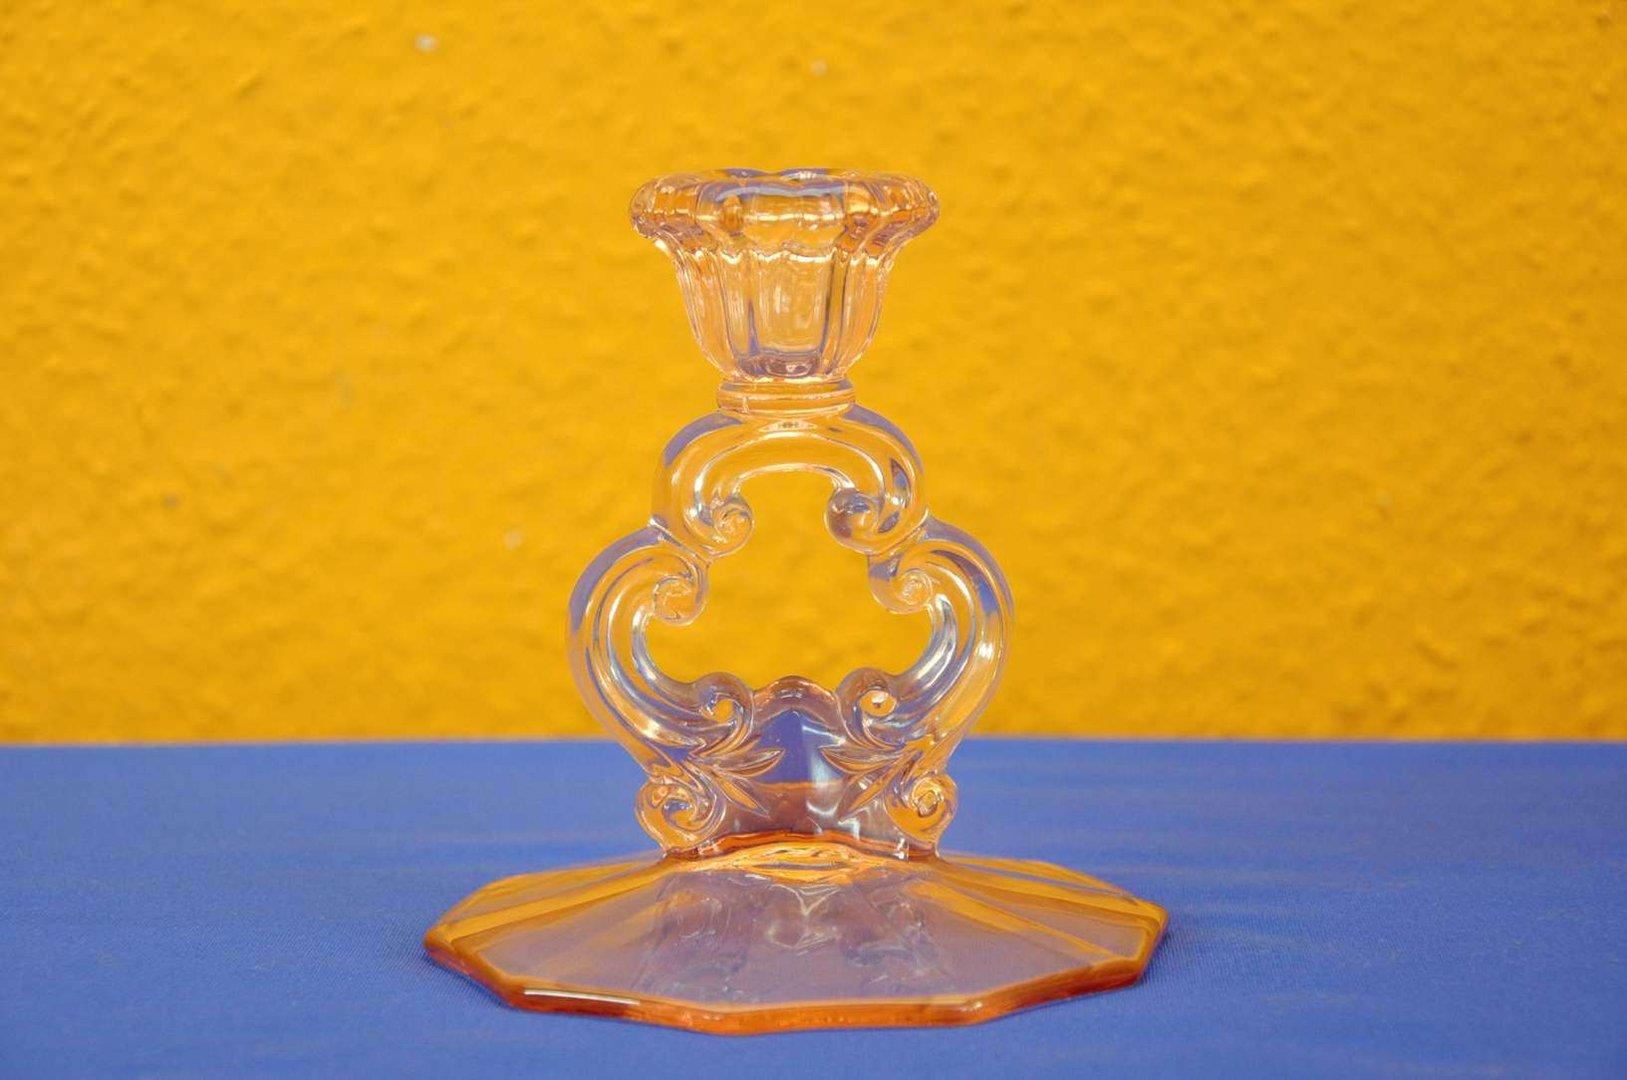 vintage roslin pressglas kerzenhalter art deco bei shop kusera. Black Bedroom Furniture Sets. Home Design Ideas